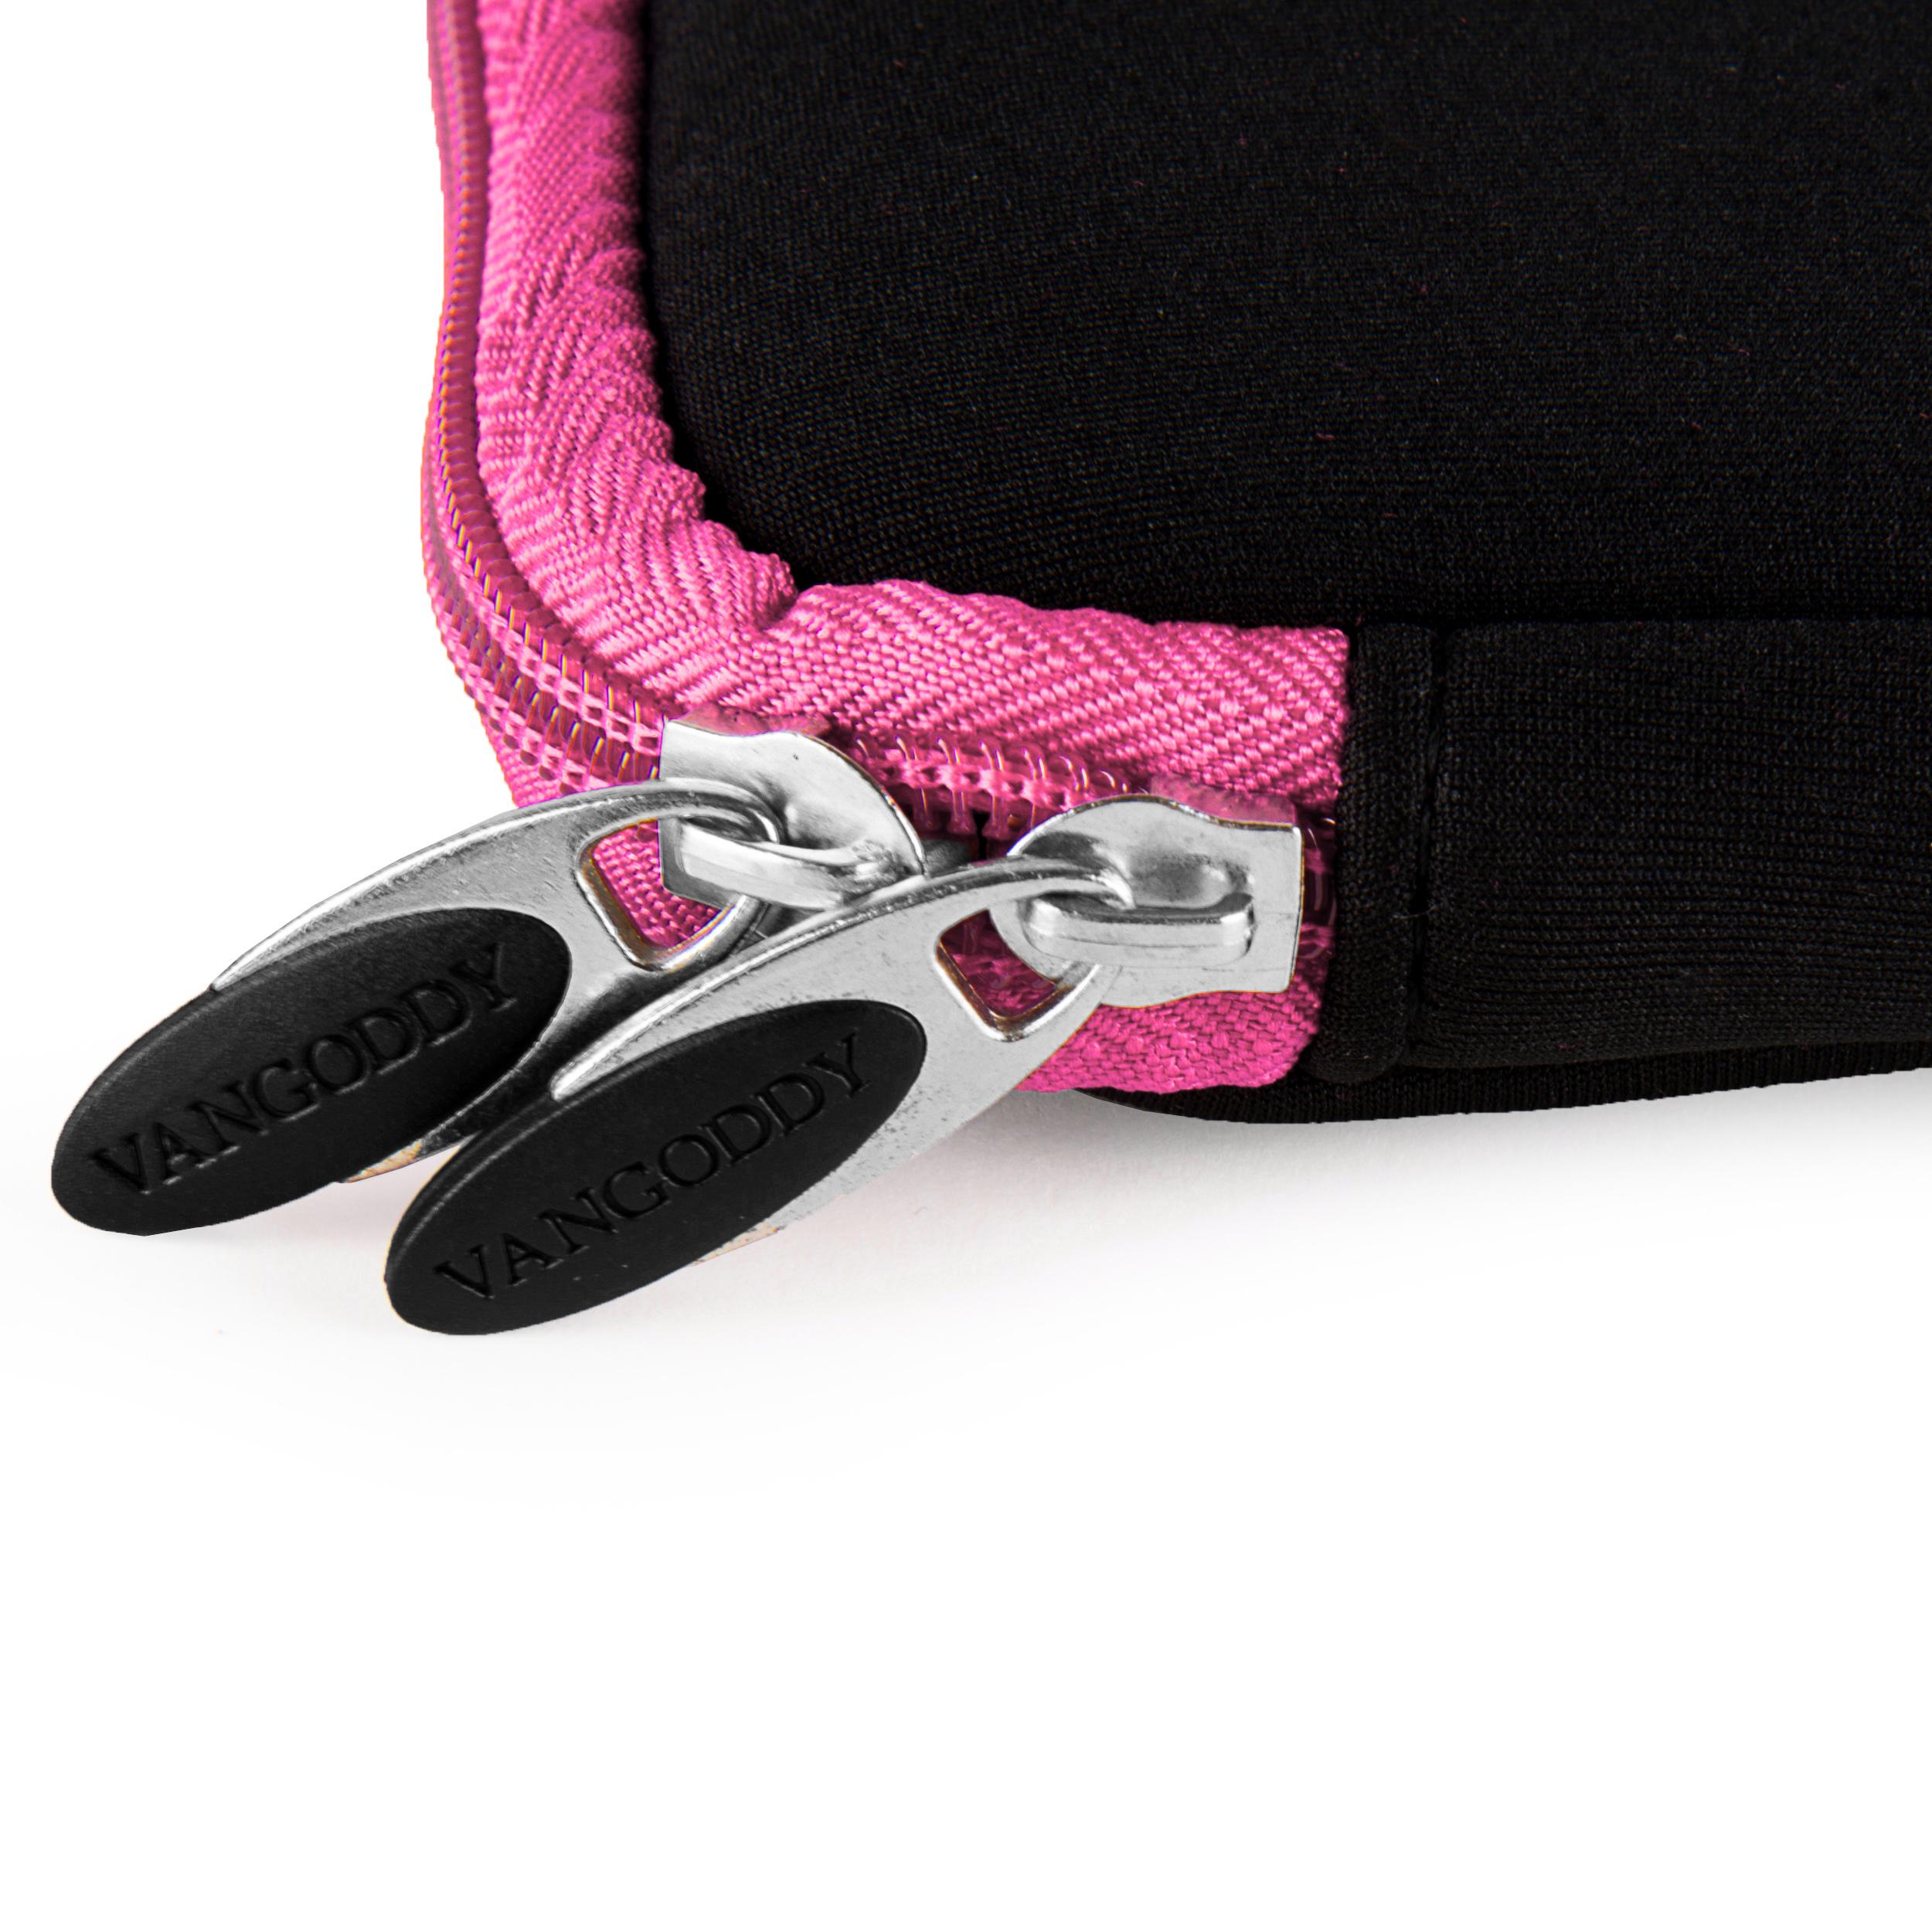 "Neoprene Sleeve 14"" (Black/Pink Trim)"